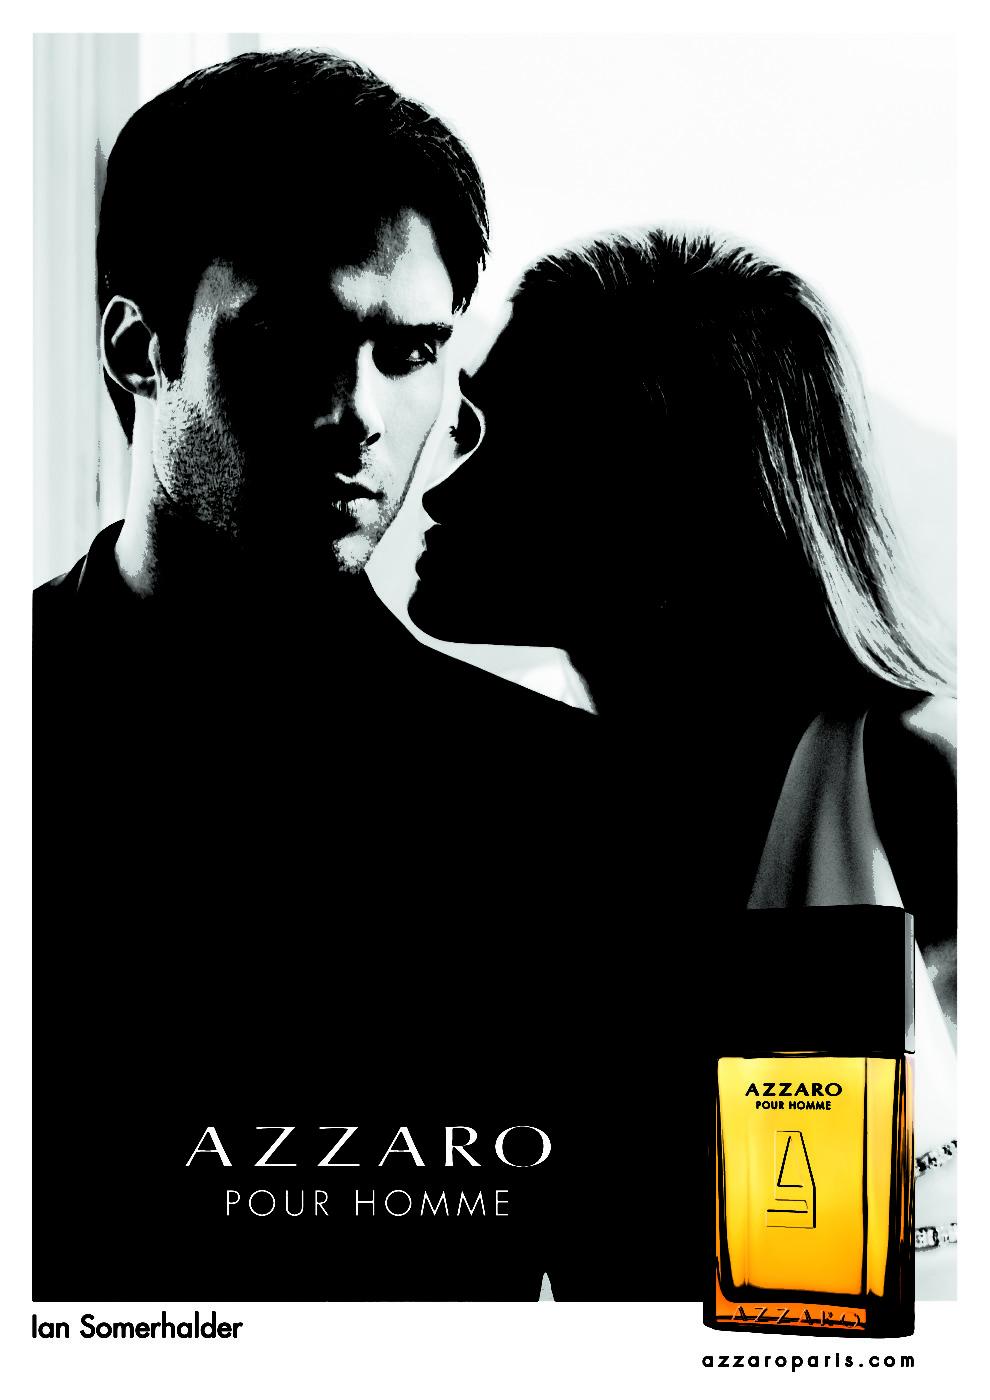 azzaro pour homme, azzaro, azzaro cologne, azzaro fragrance, azzaro man, azzaro ian somerhalder, cologne, best cologne for christmas, cologne gift set, ian somerhalder